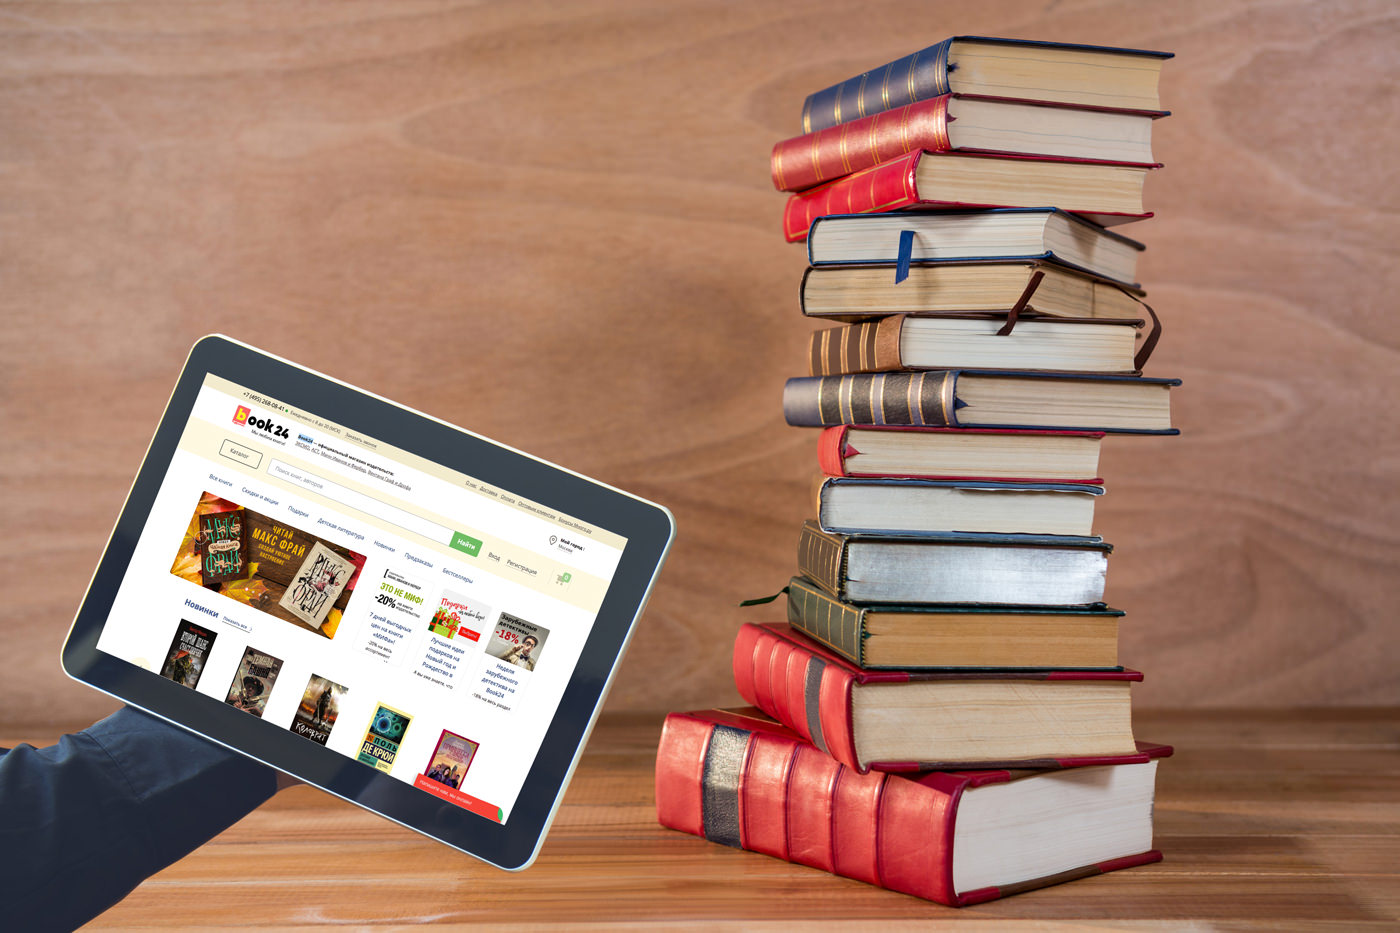 Купить онлайн книги недорого на сайте